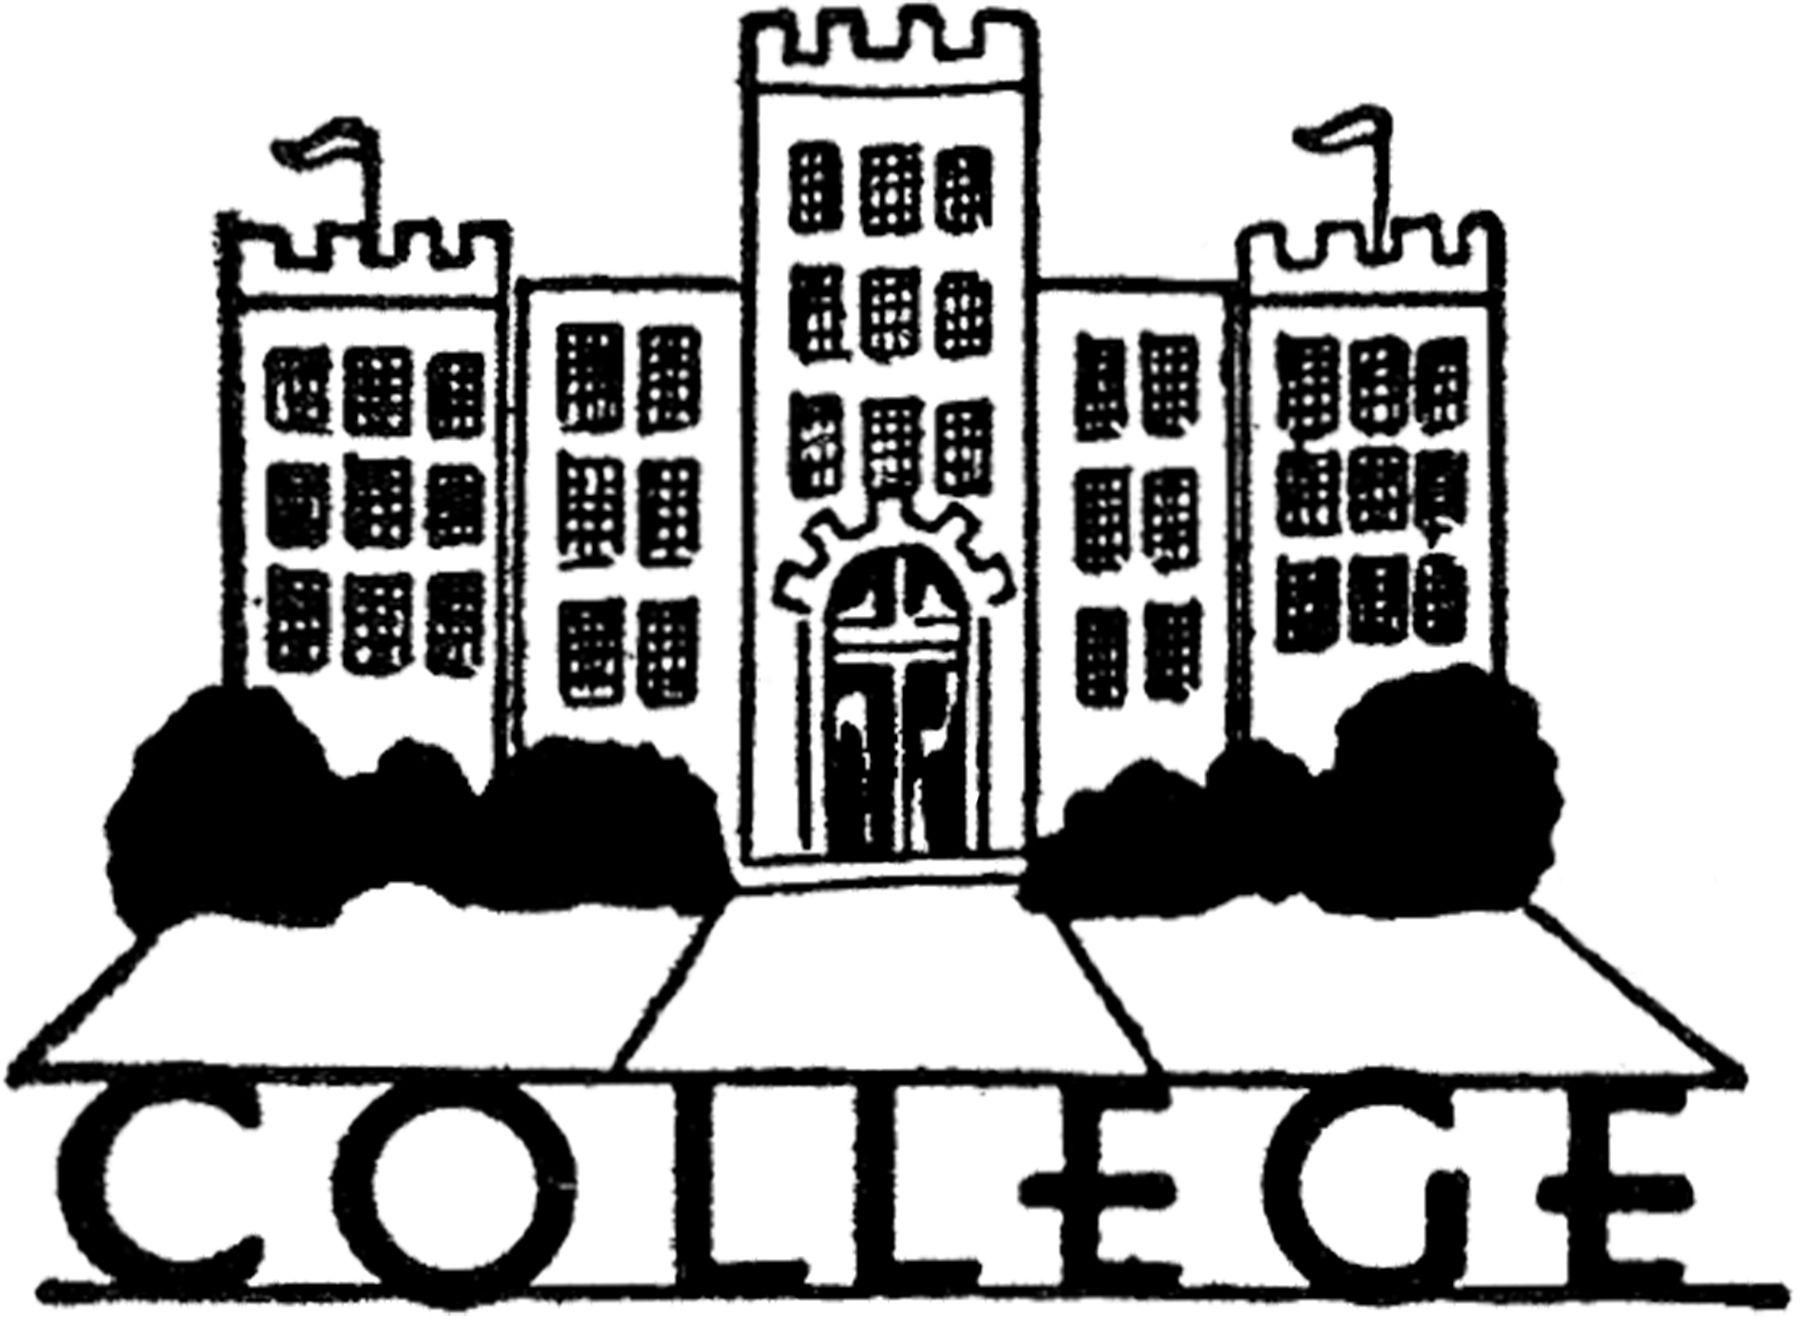 Vintage College Image!   College image, Graphics fairy, Free clip art